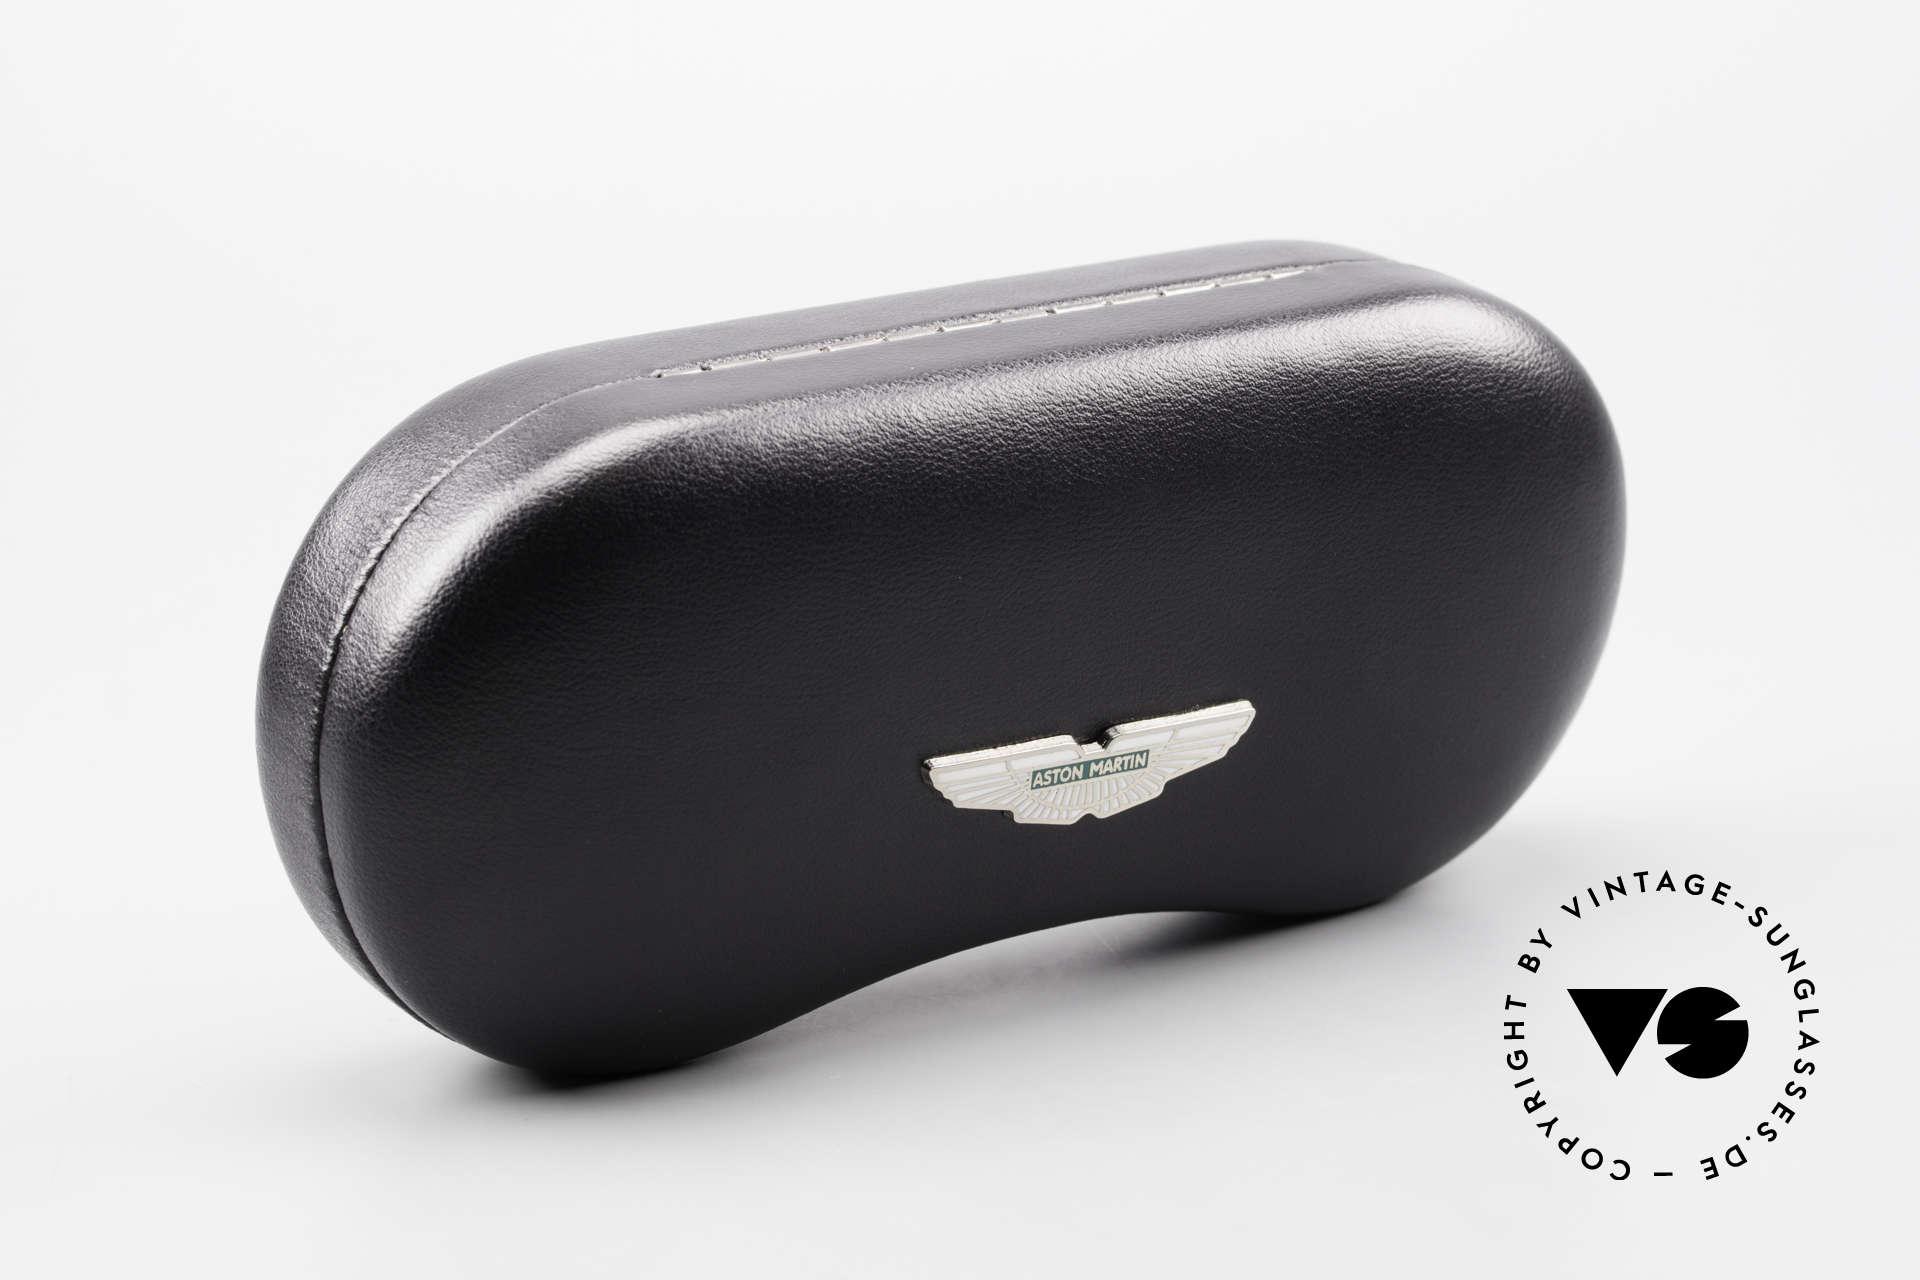 Aston Martin AM34 Oval James Bond Glasses 007, Size: medium, Made for Men